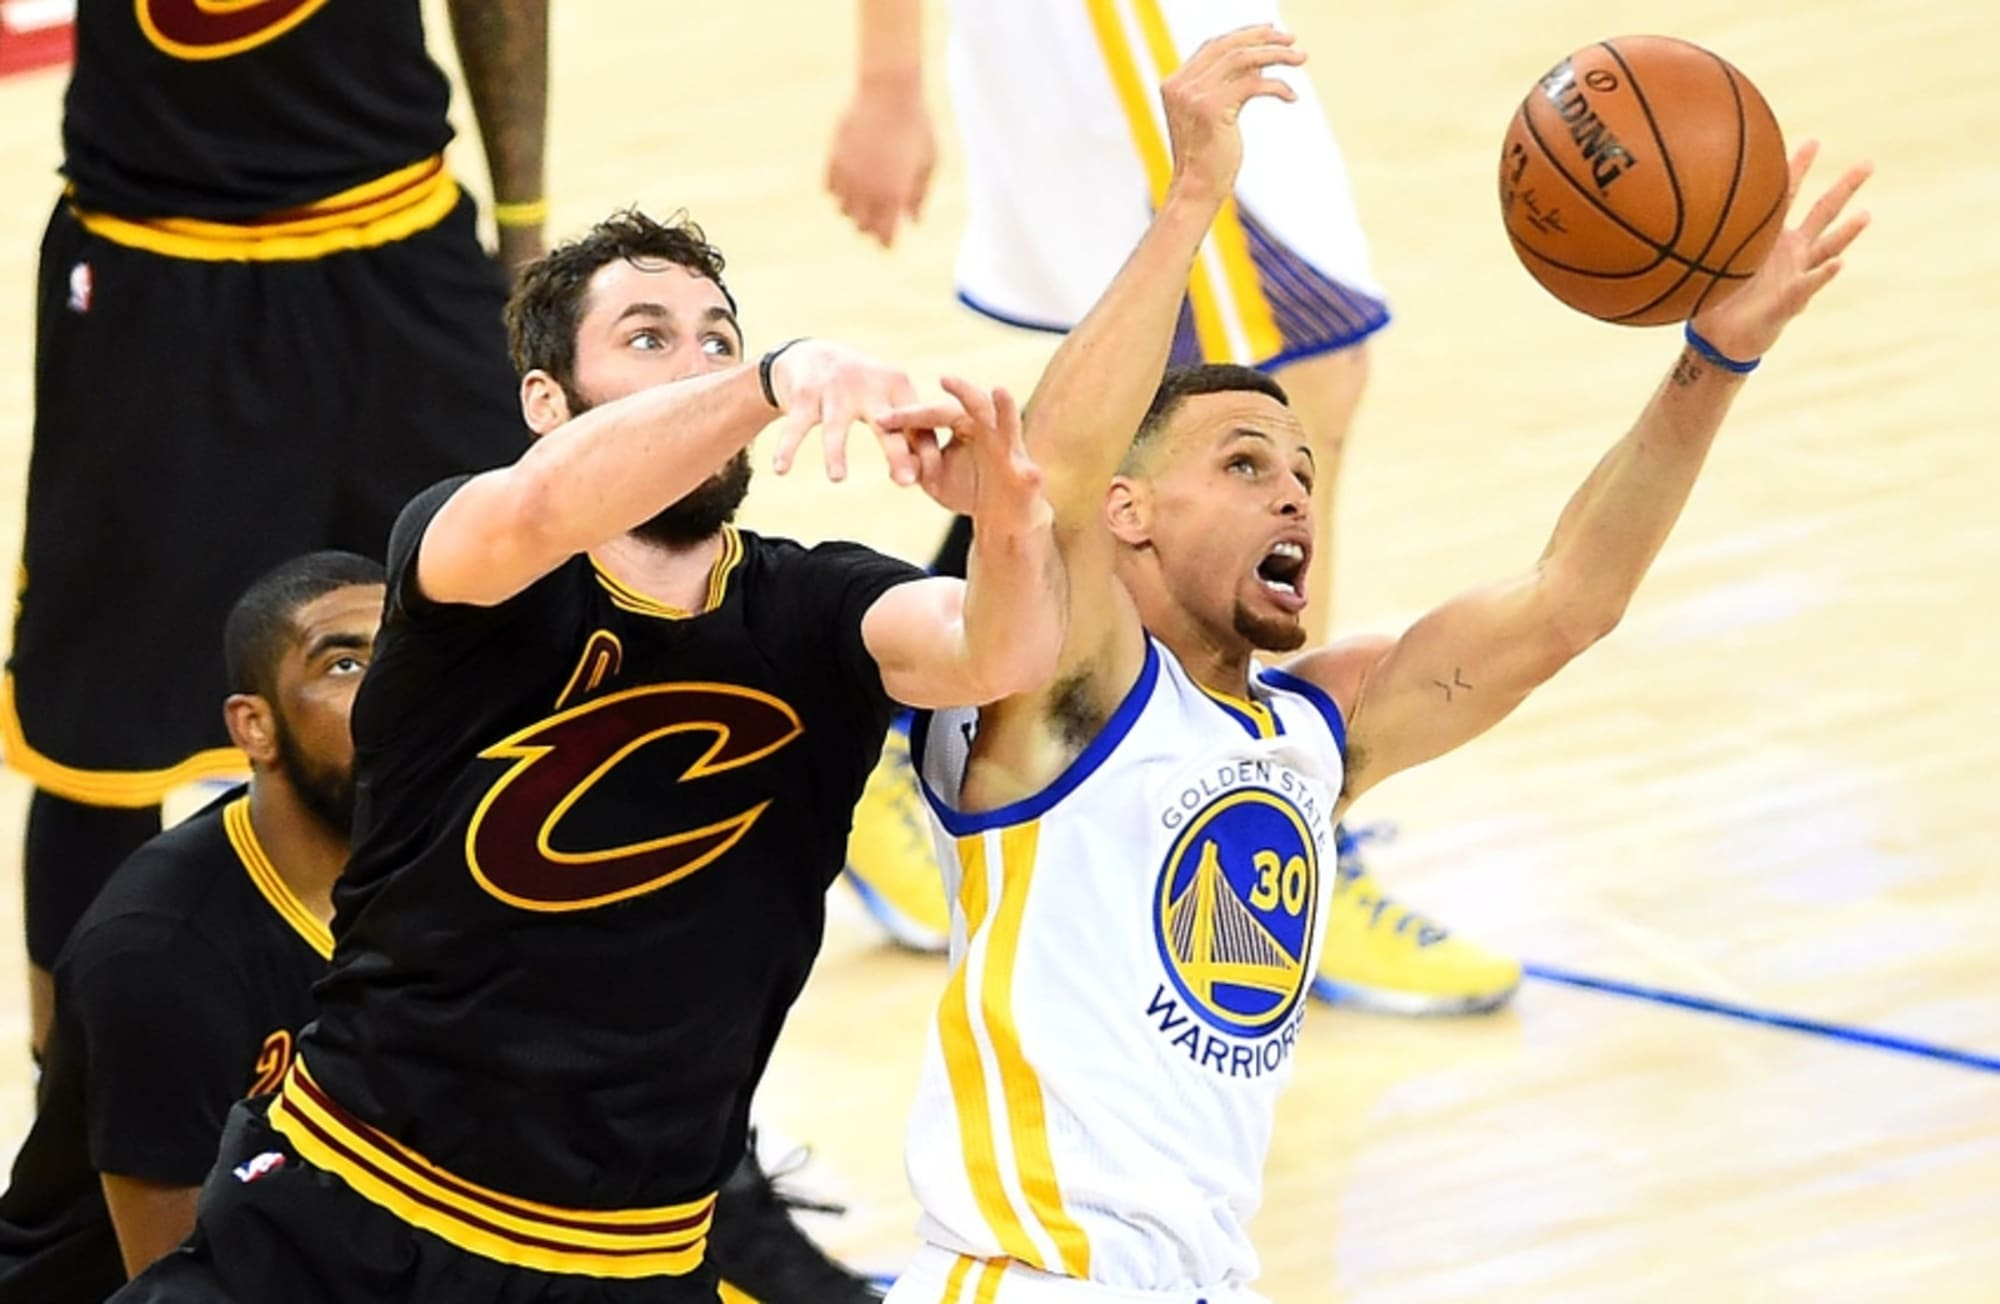 Warriors vs. Cavaliers Game 6 live stream: Watch online